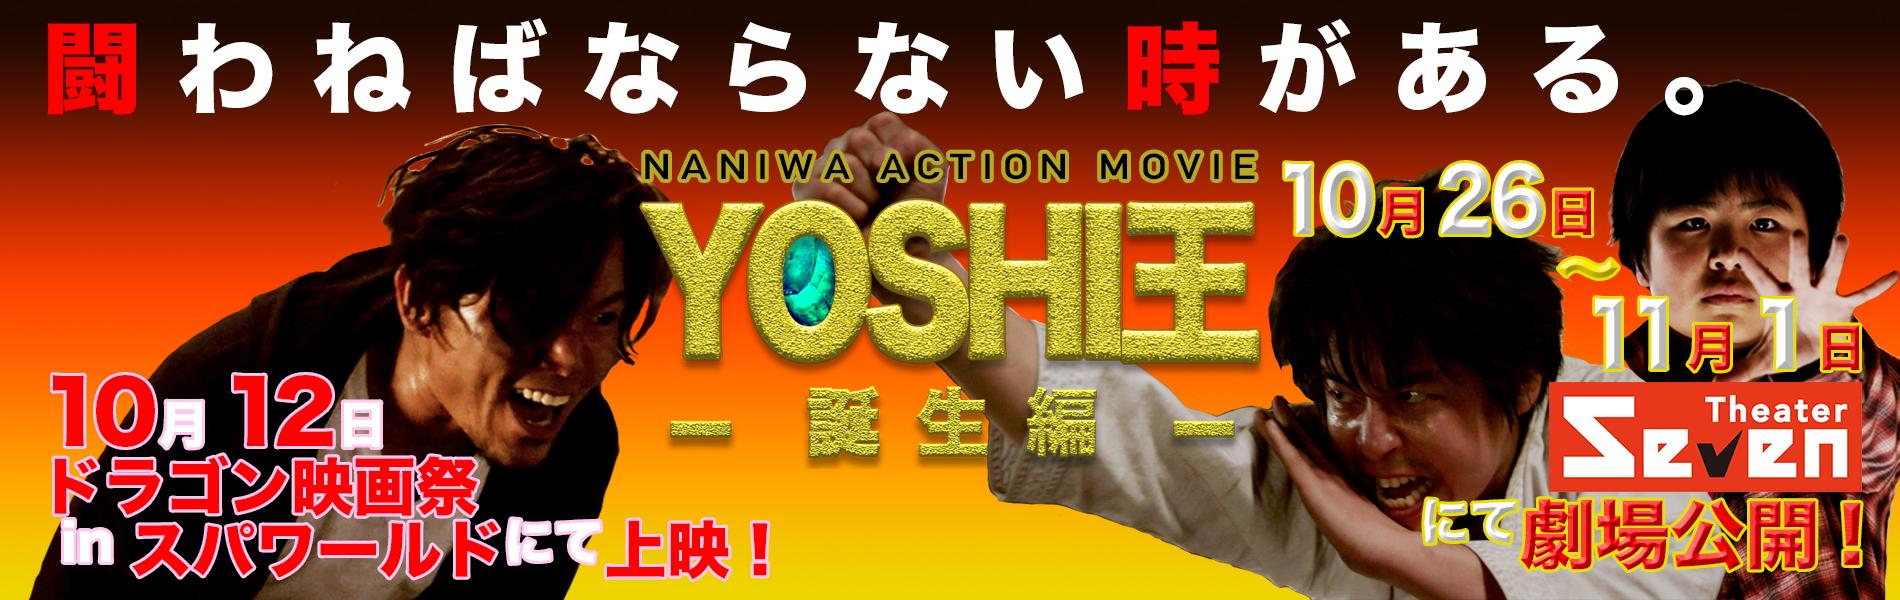 映画『YOSHI王-誕生編-』